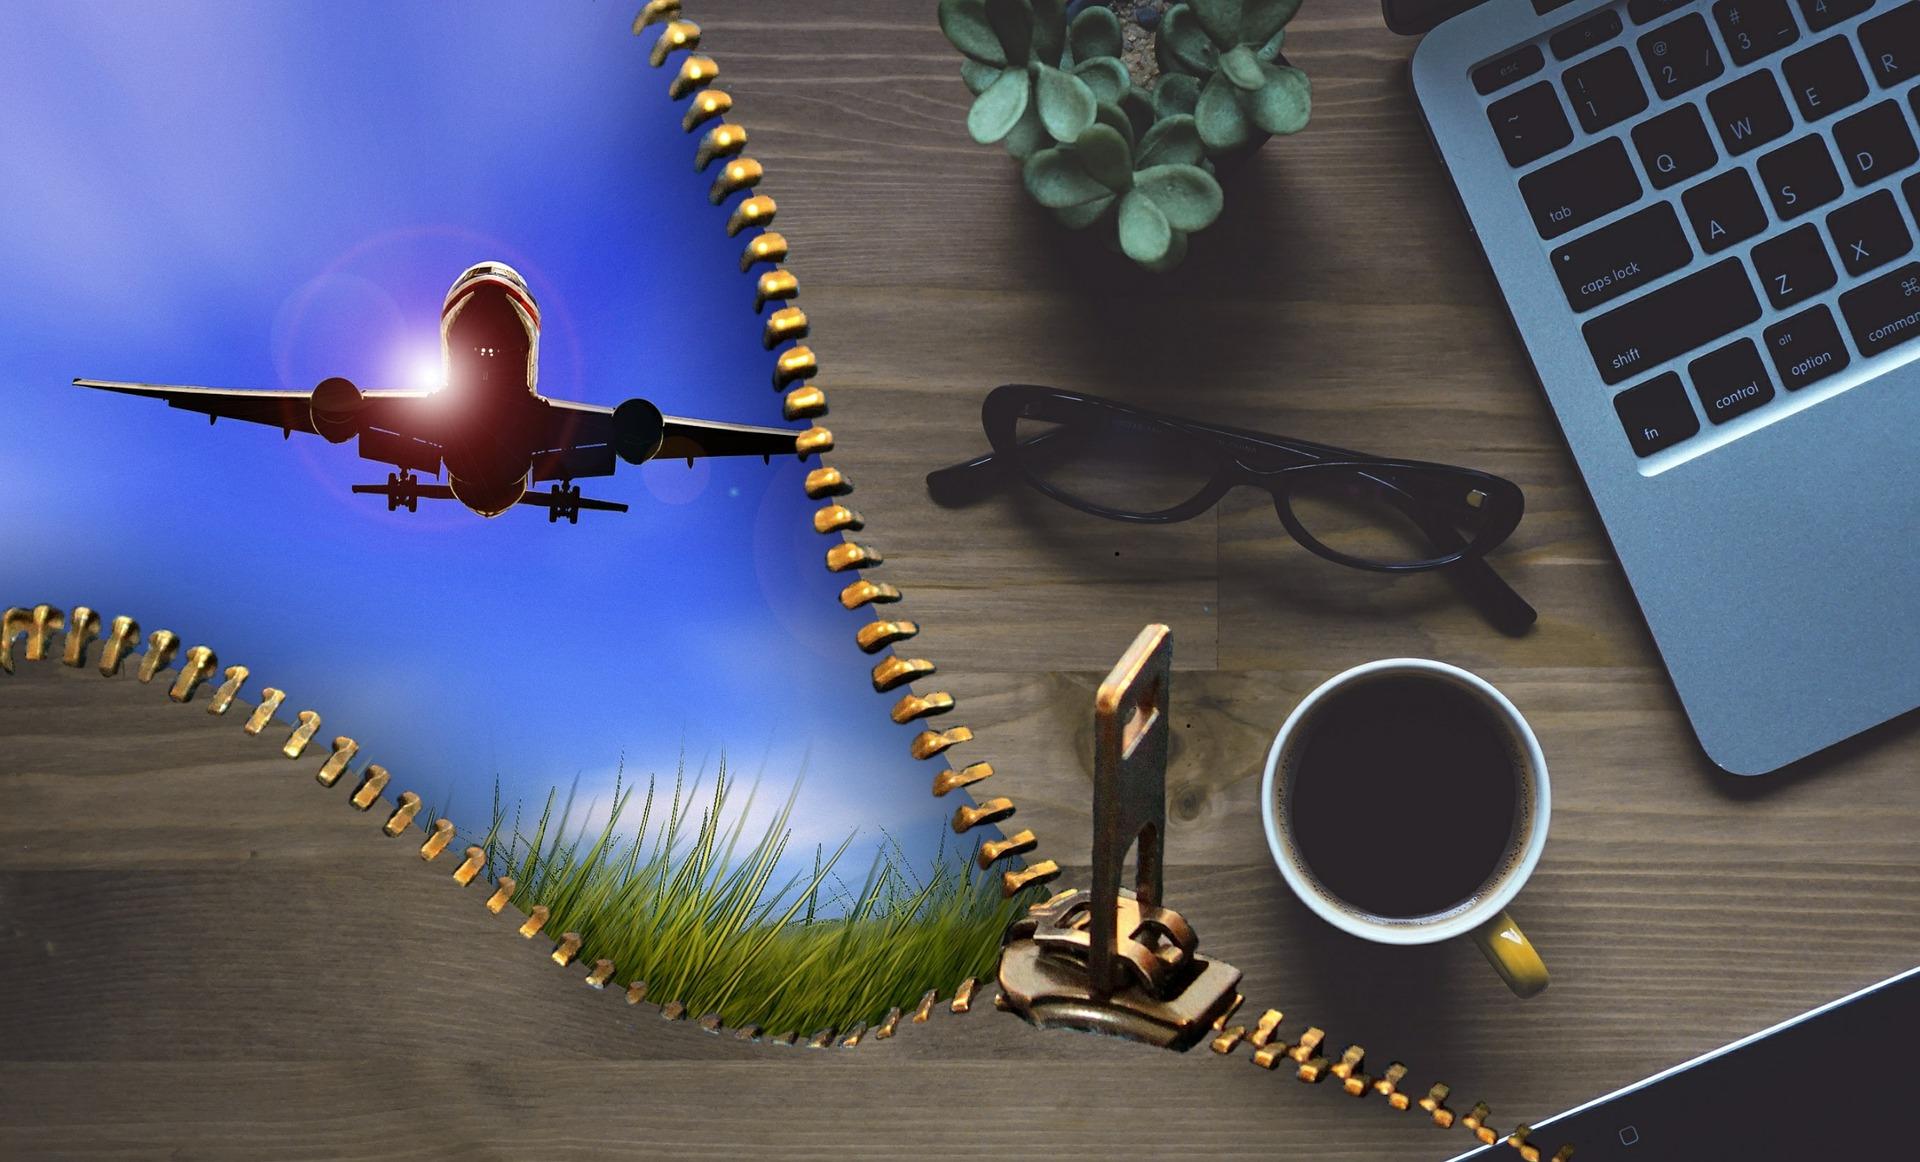 Aeroplane and laptop